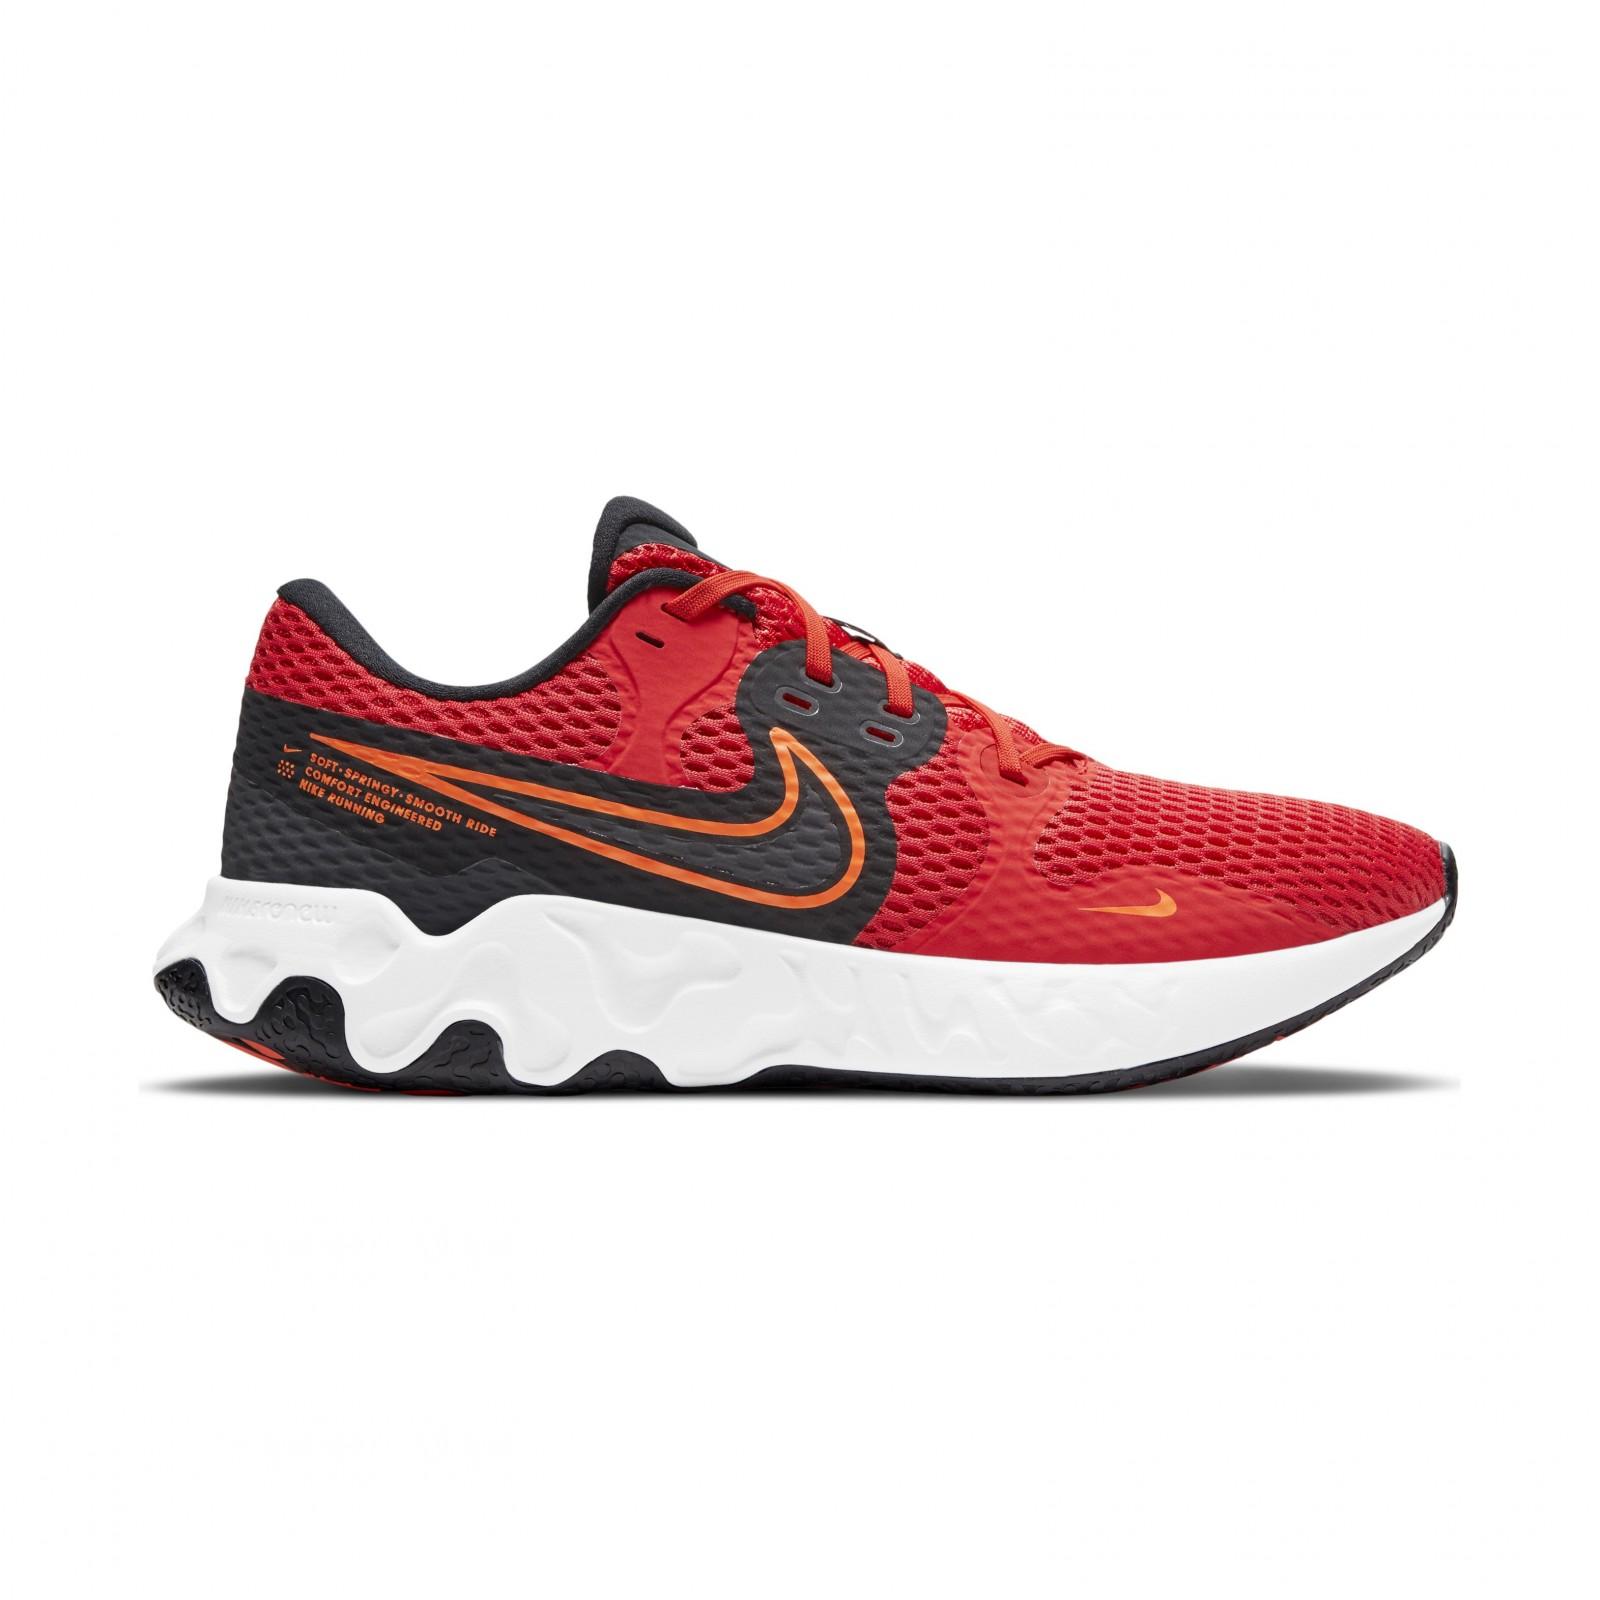 Nike Renew Ride 2 CHILE RED/DK SMOKE GREY-HYPER CRIMSON